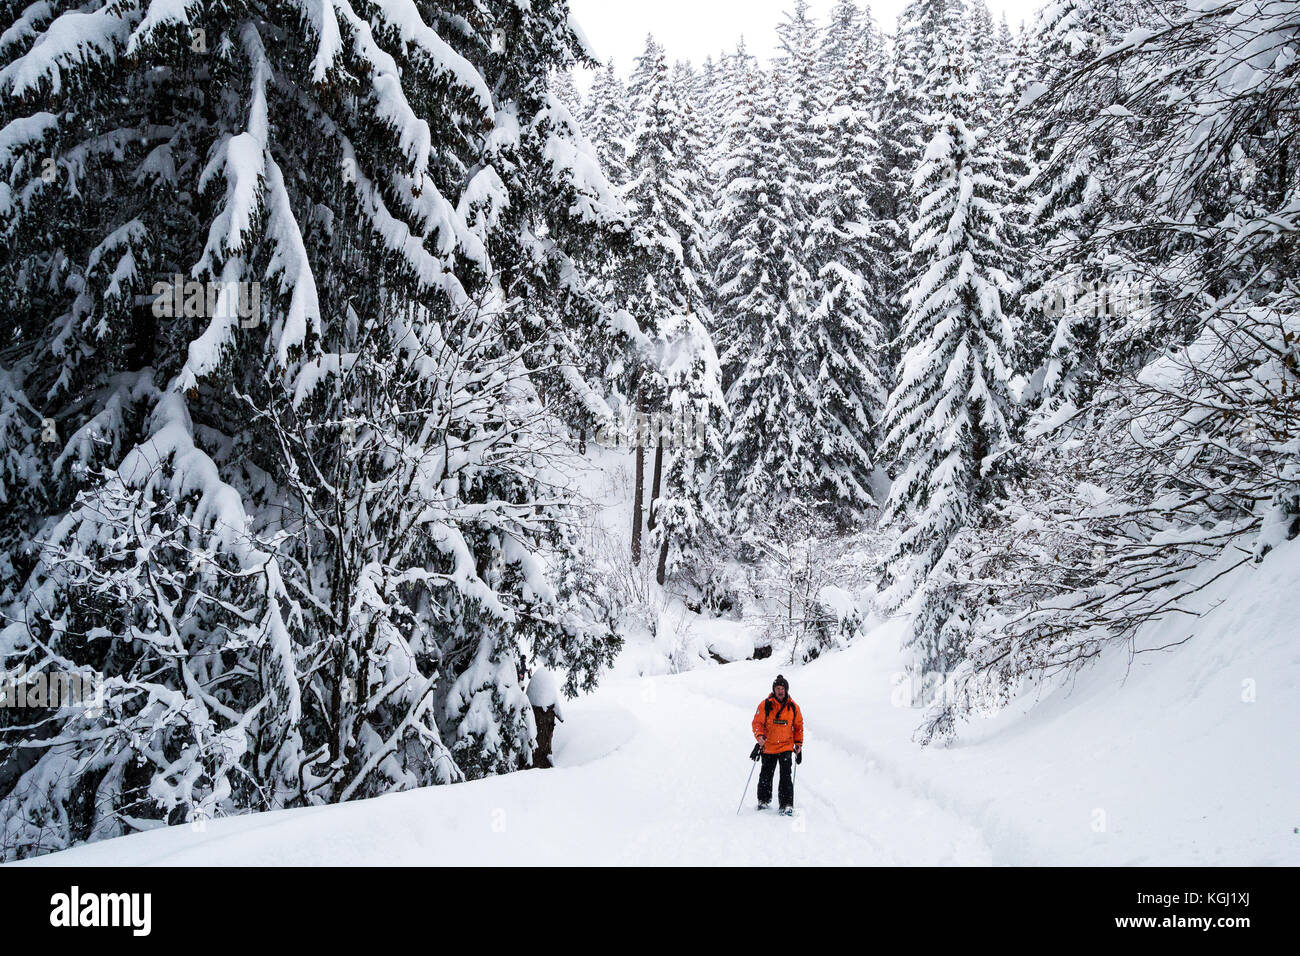 Walker trekking through snow forest. Les Arcs, Savoie. France - Stock Image